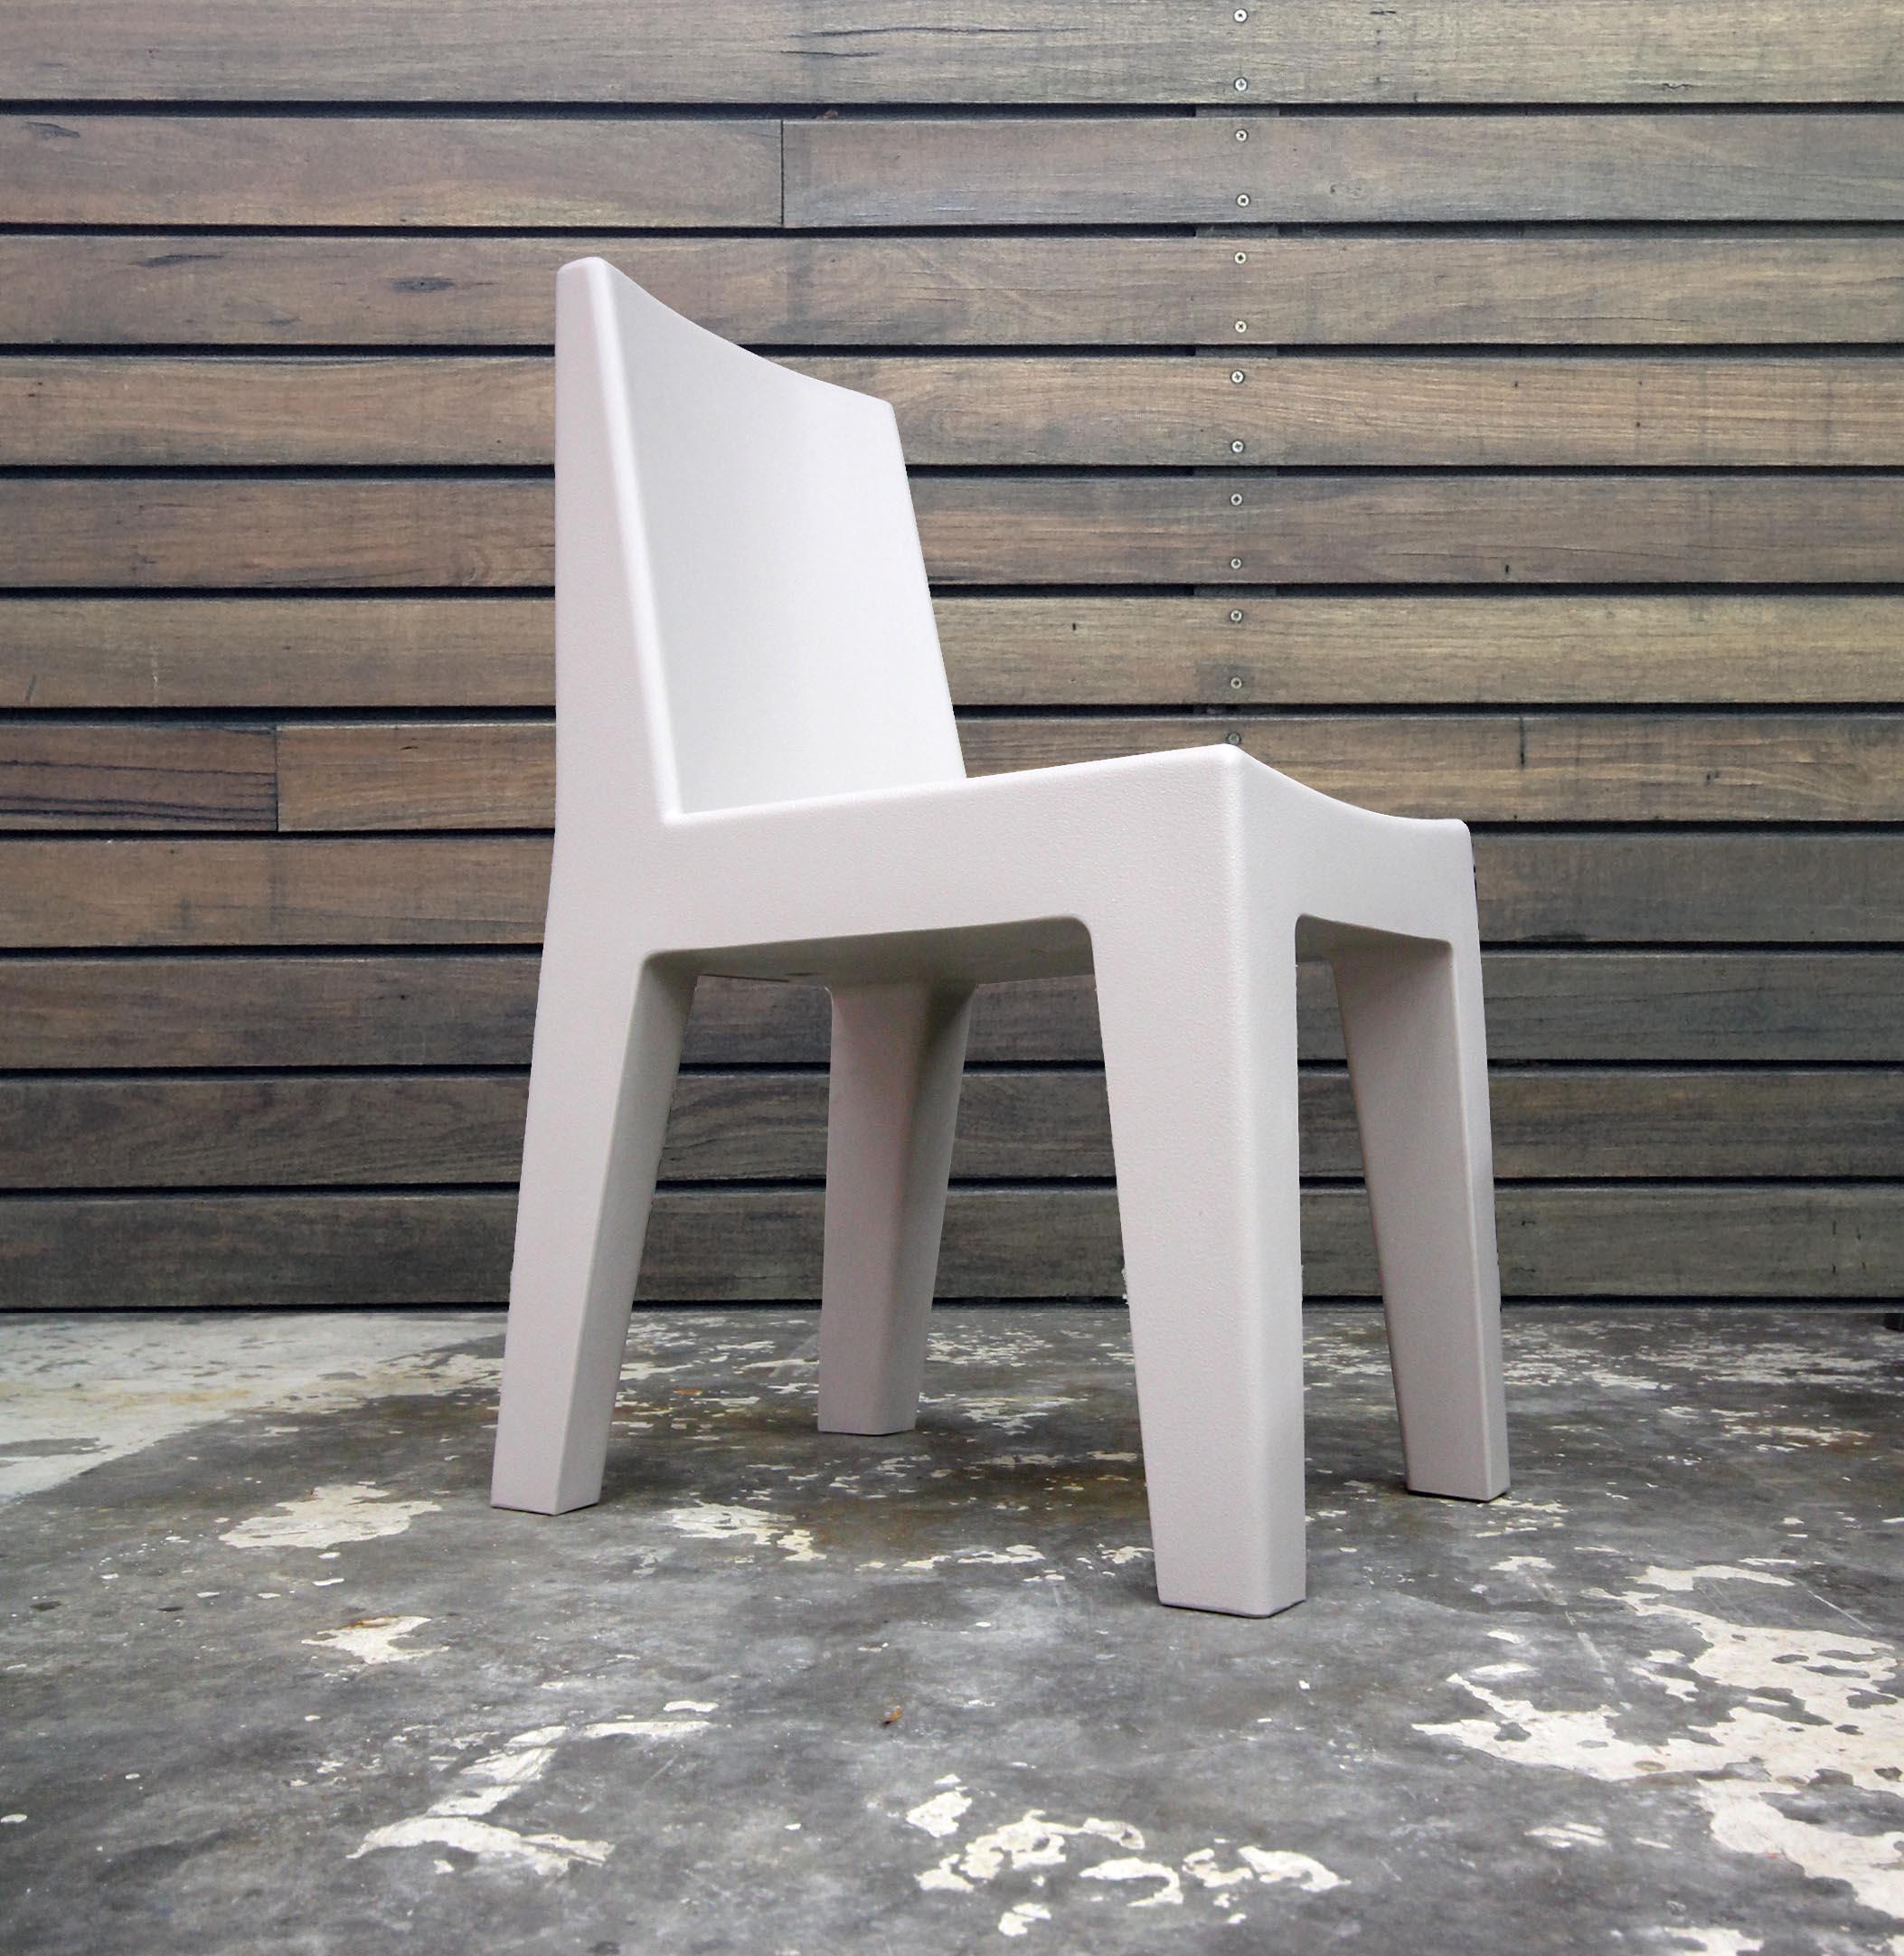 korban flaubert_mighty chair birch grey.jpg